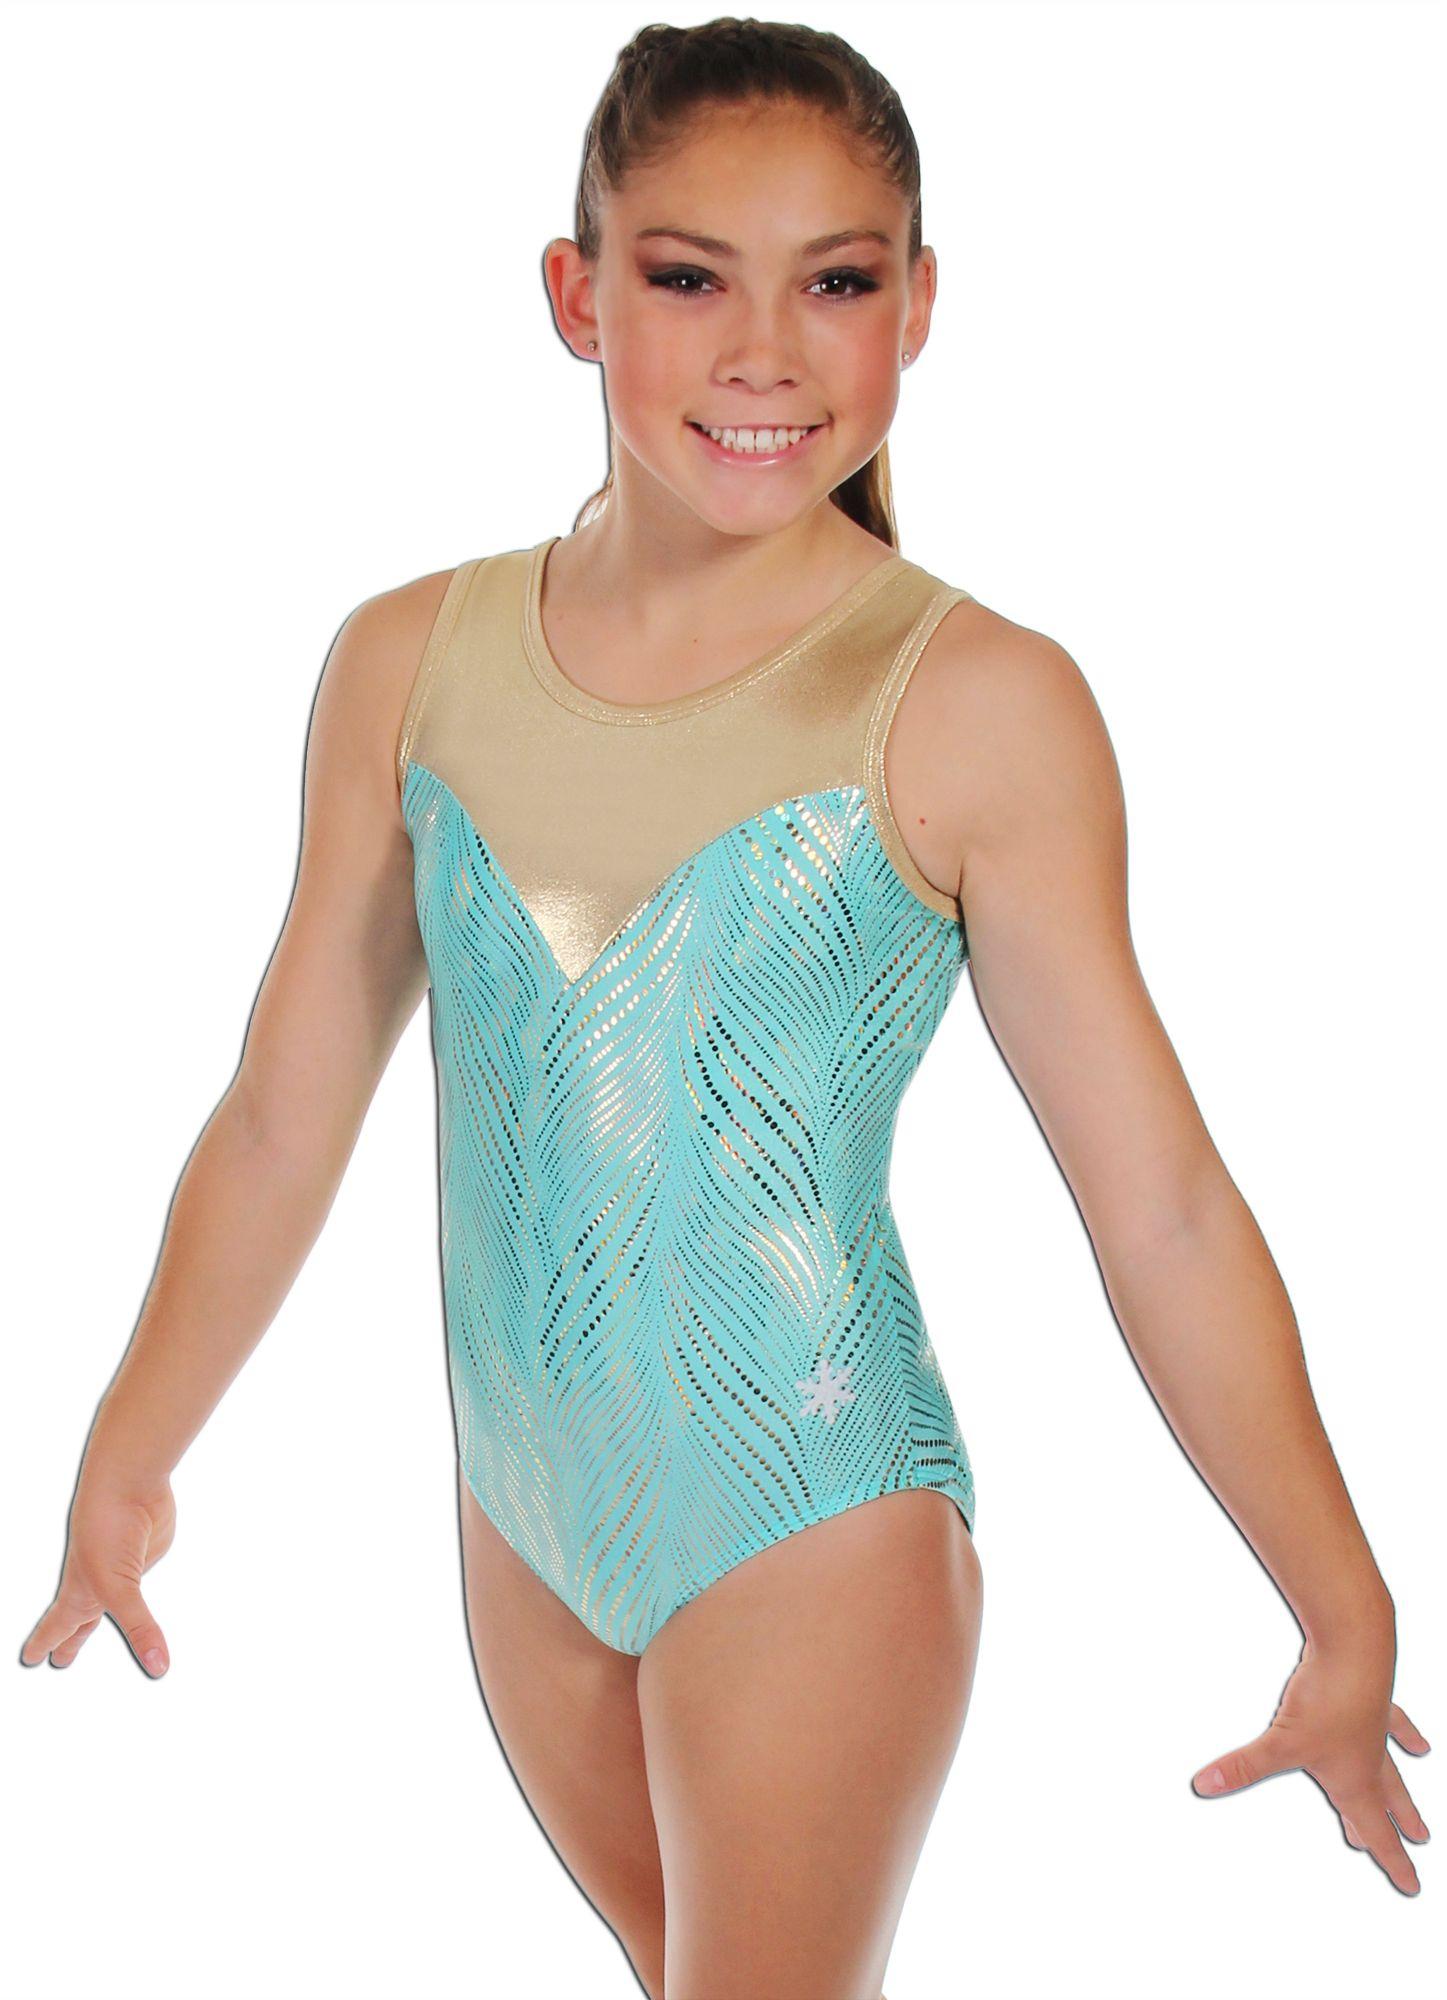 Girls Turquoise Swirl metallic sleeveless leotard ALL SIZES dance gymnastics